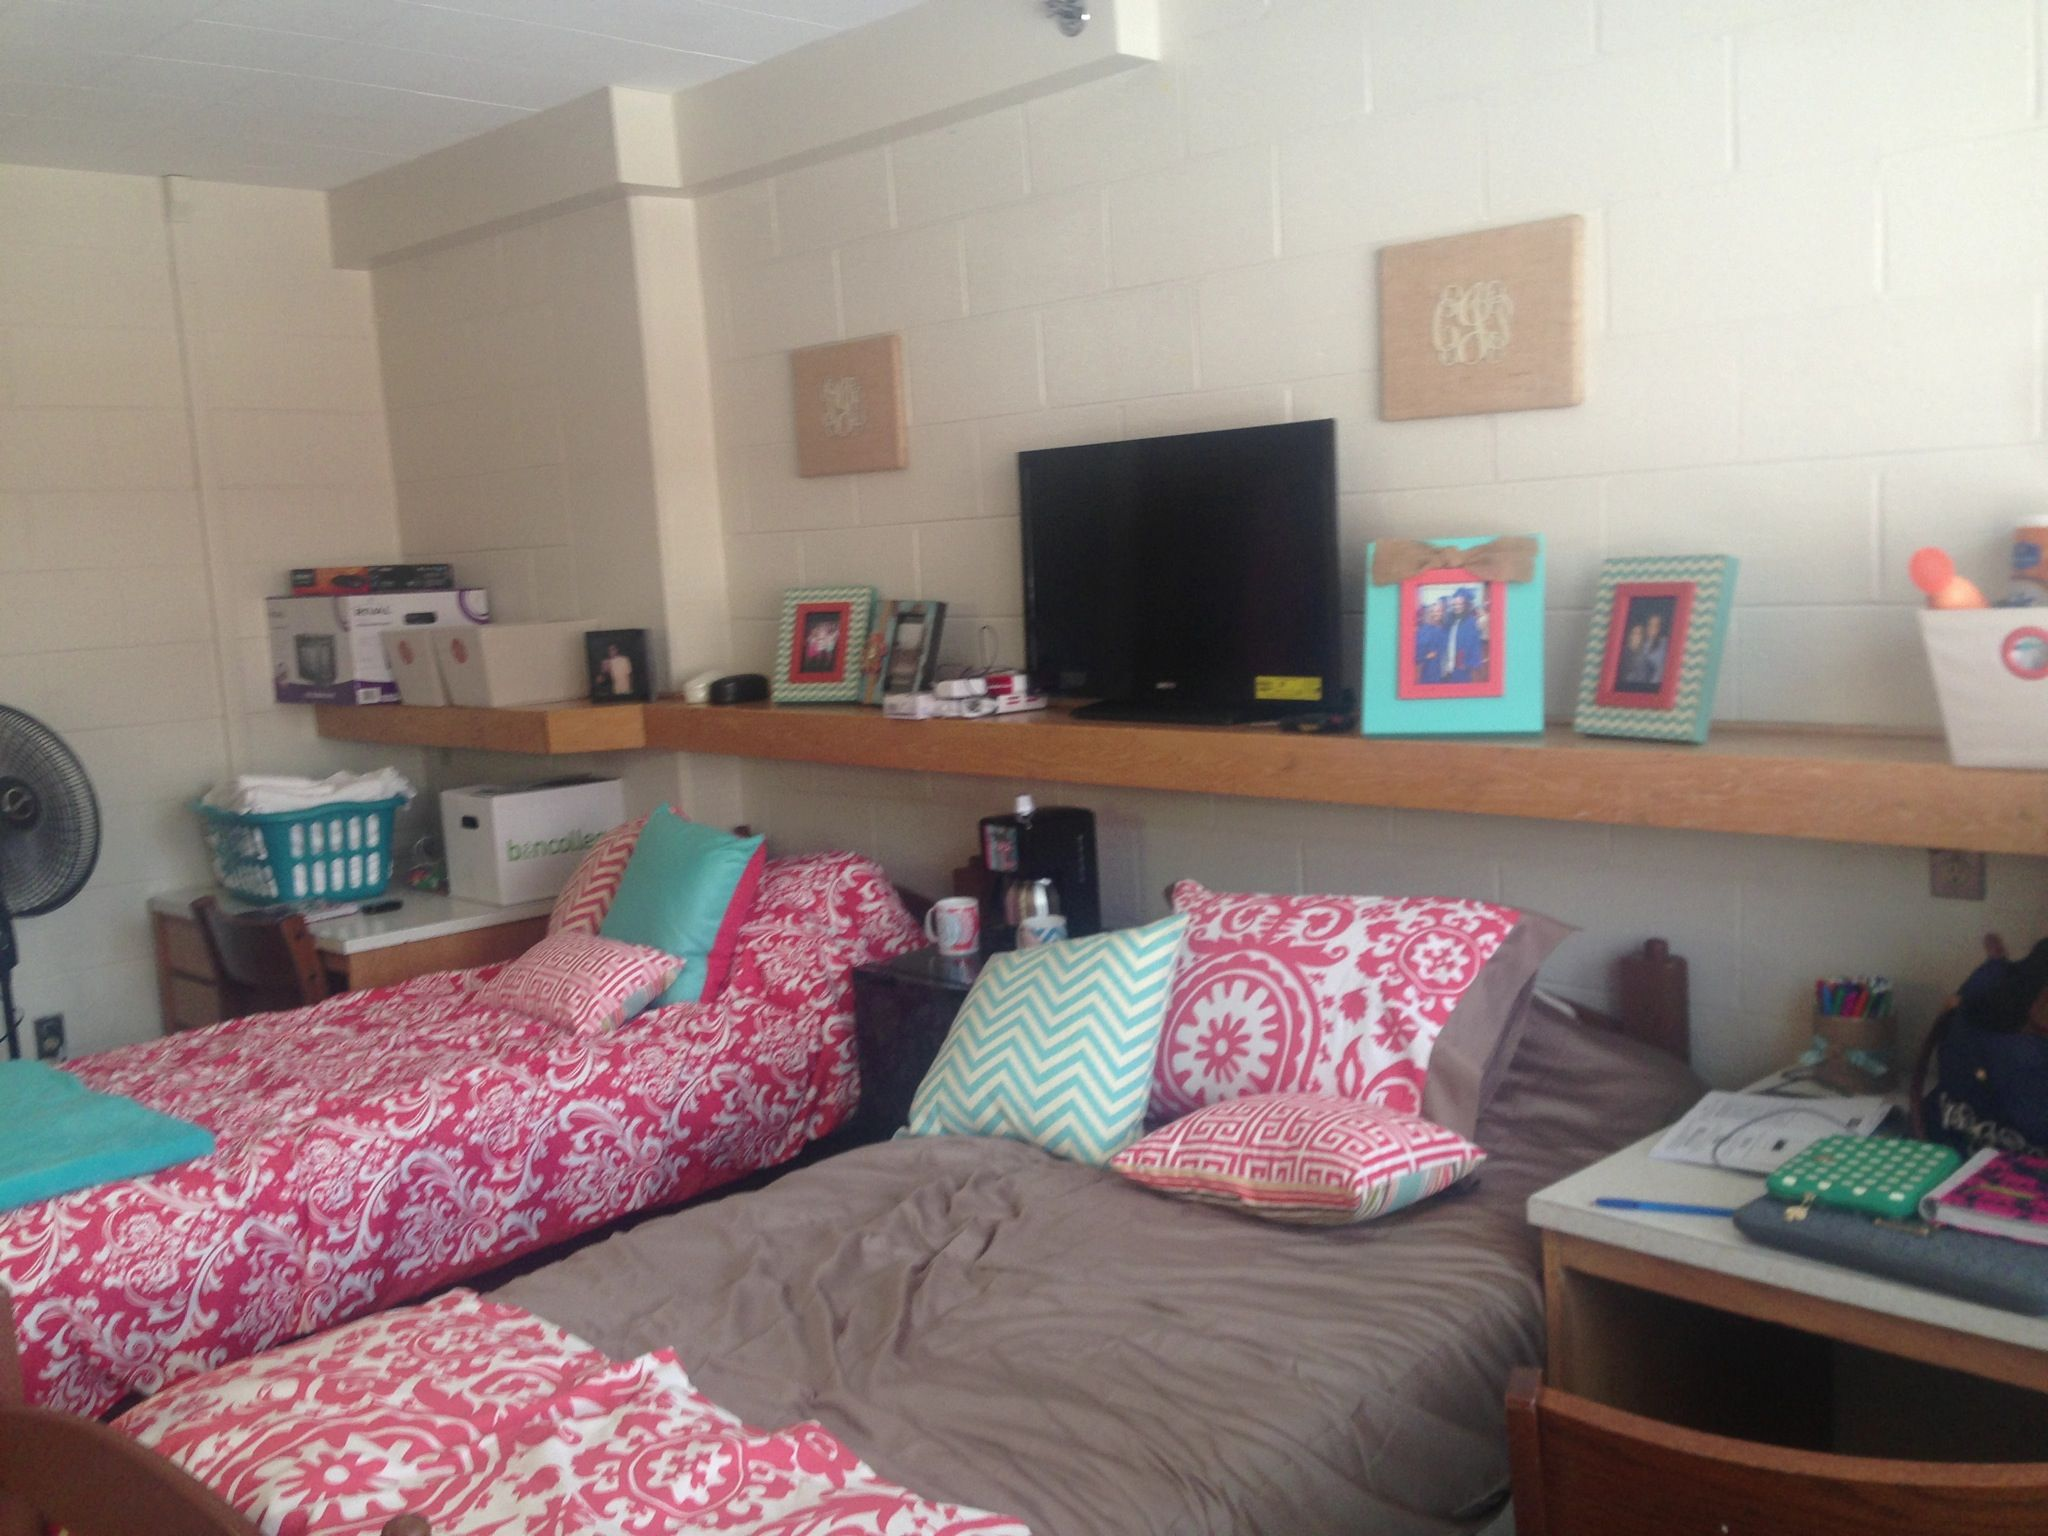 Dorm Room One Floating Shelf Across Entire Wall Shelf Has